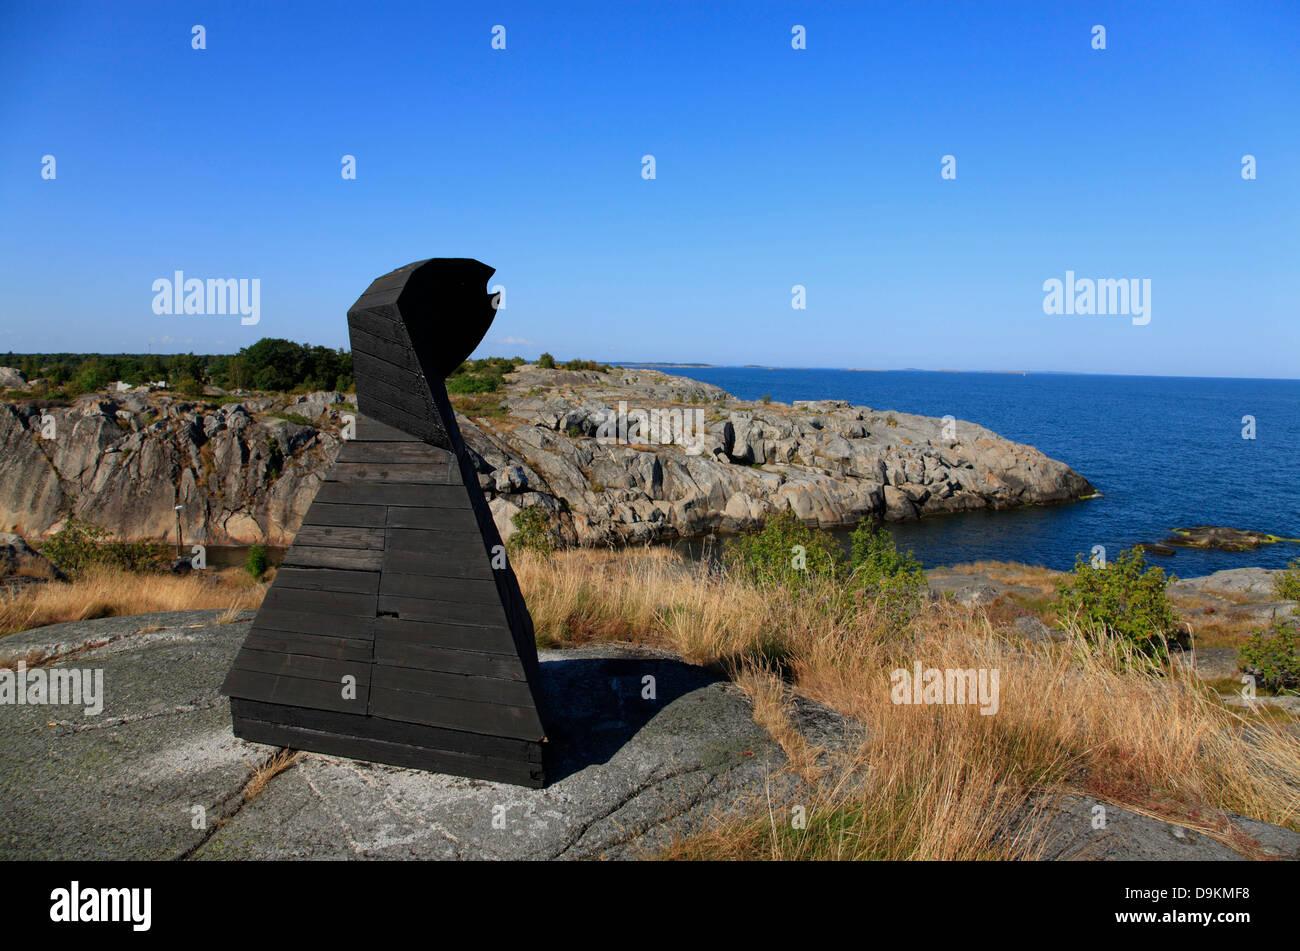 Art-Objekt, Artist Ole Drebold, Landsort Island (Oeja), Stockholm Archipelago, baltic sea coast, Sweden, Scandinavia - Stock Image